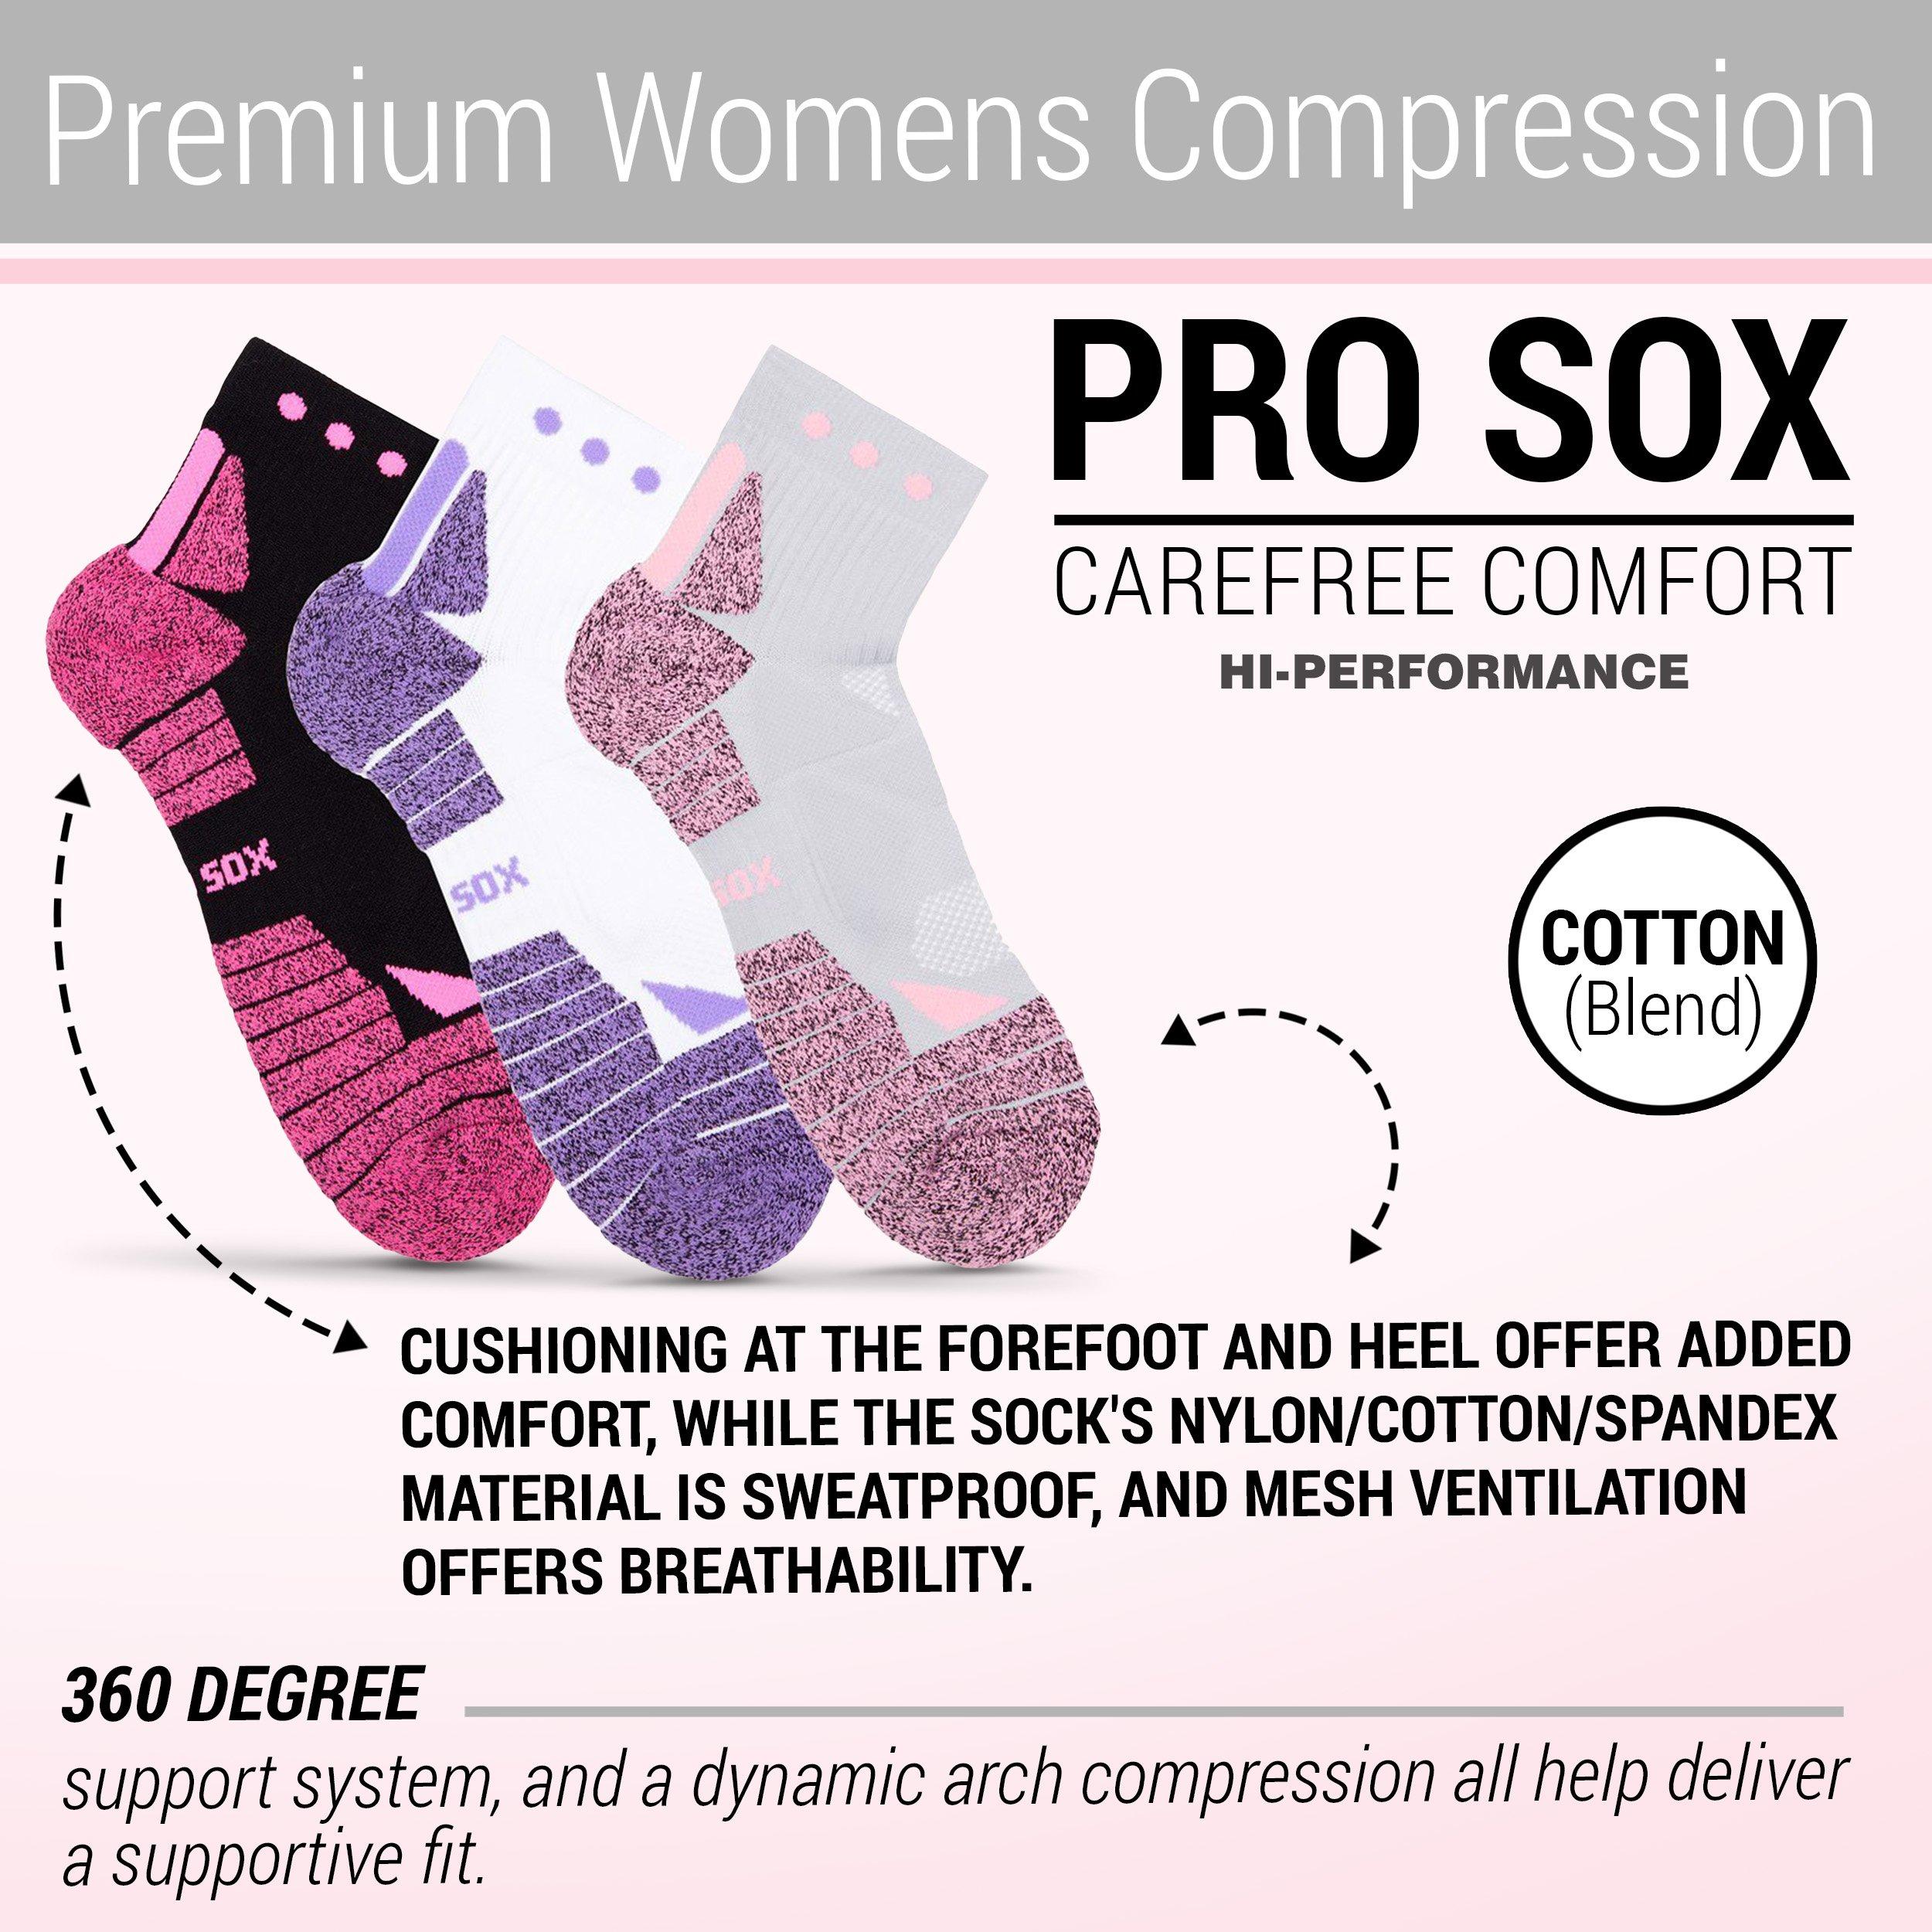 Hi-Performance Pro Sox Ladies 3 Pack Quarter Length Athletic Socks, Size 9-11 Multicolored-2 by Hi-performance Pro Sox (Image #6)